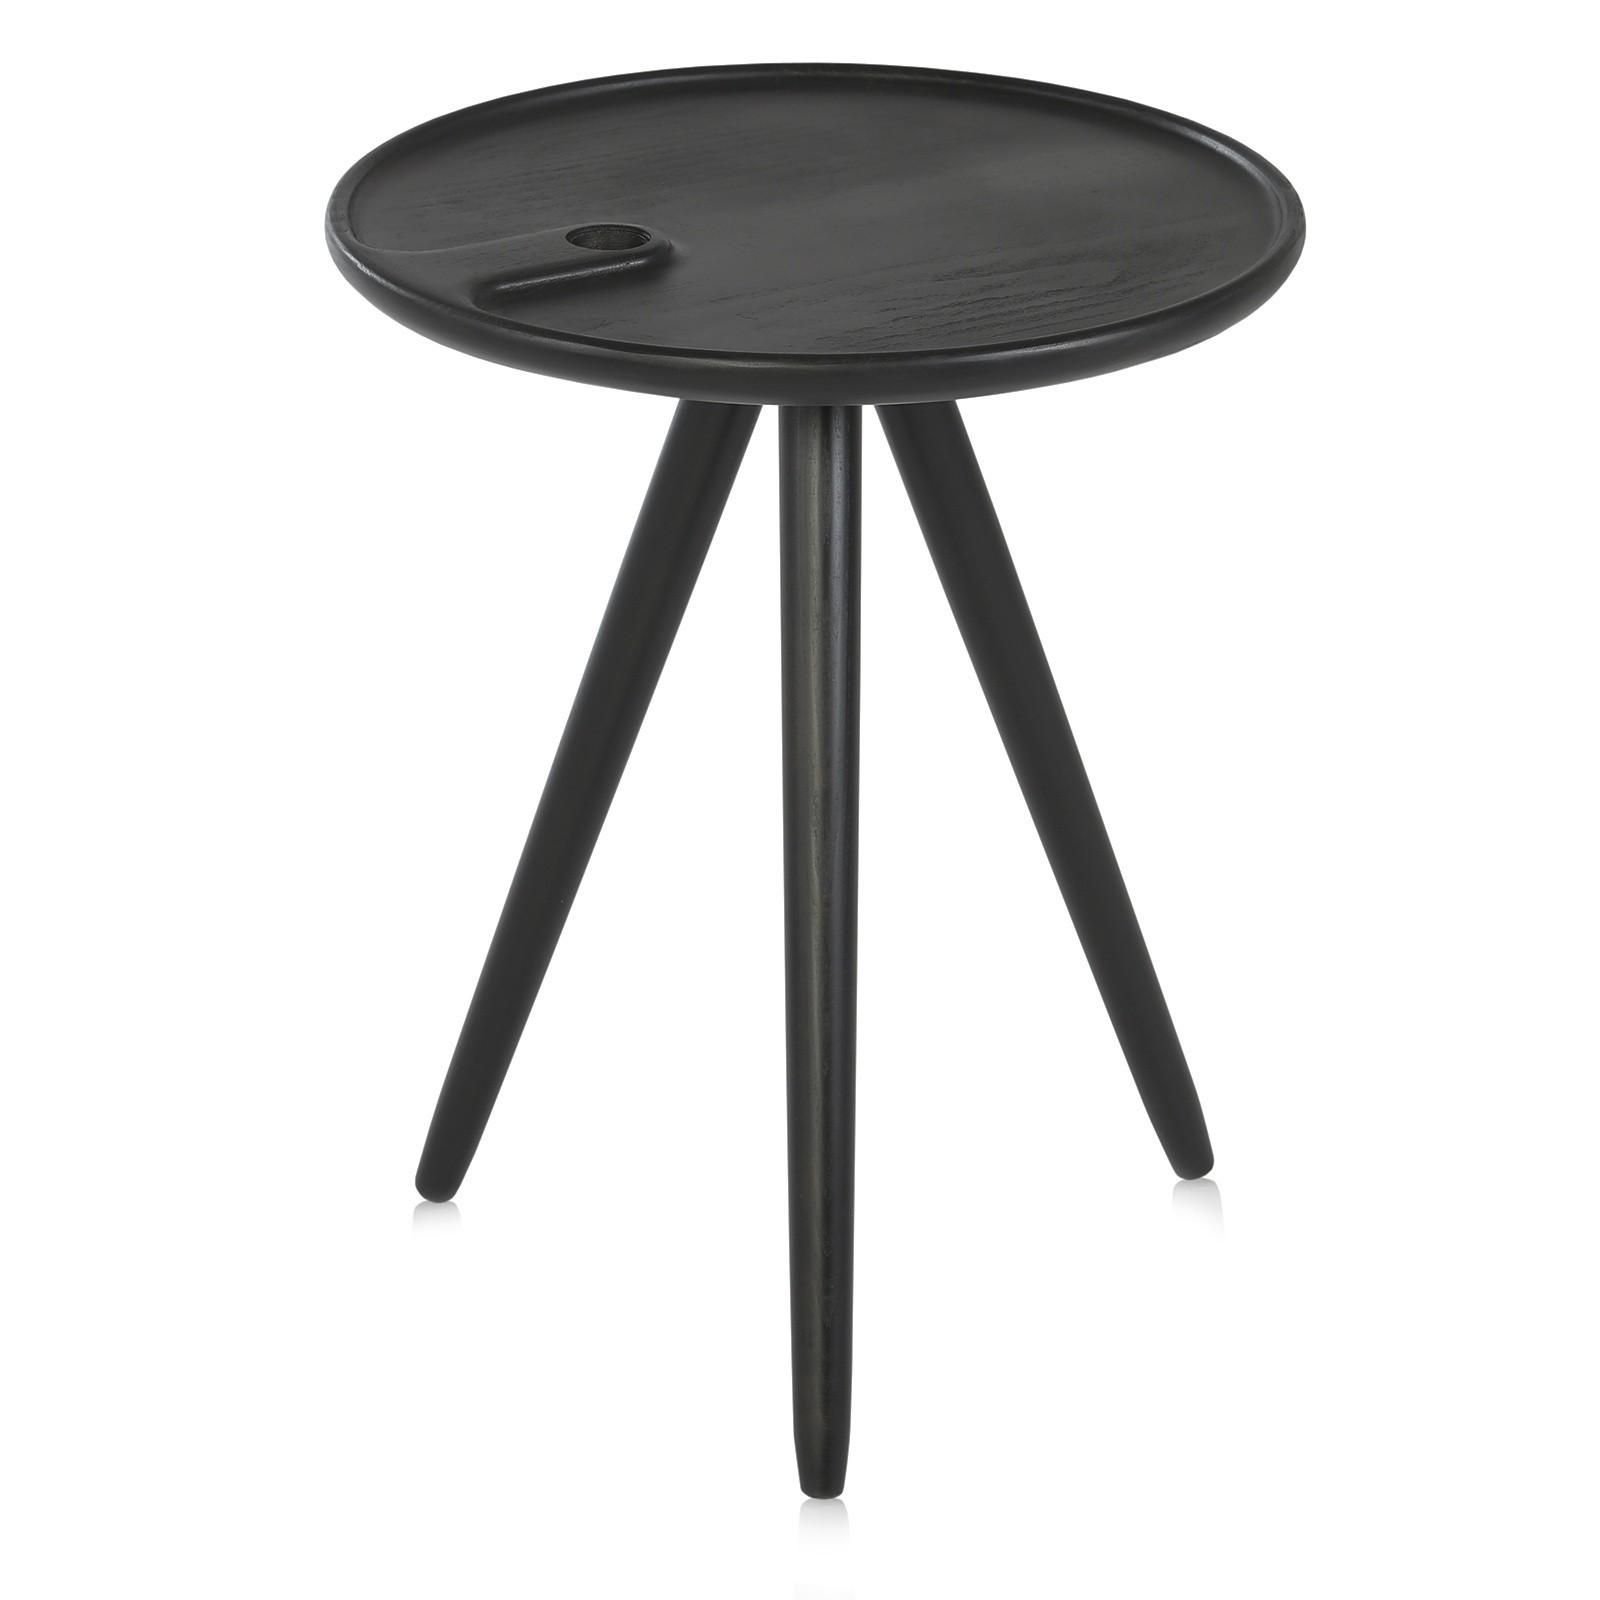 Flower coffee table - black